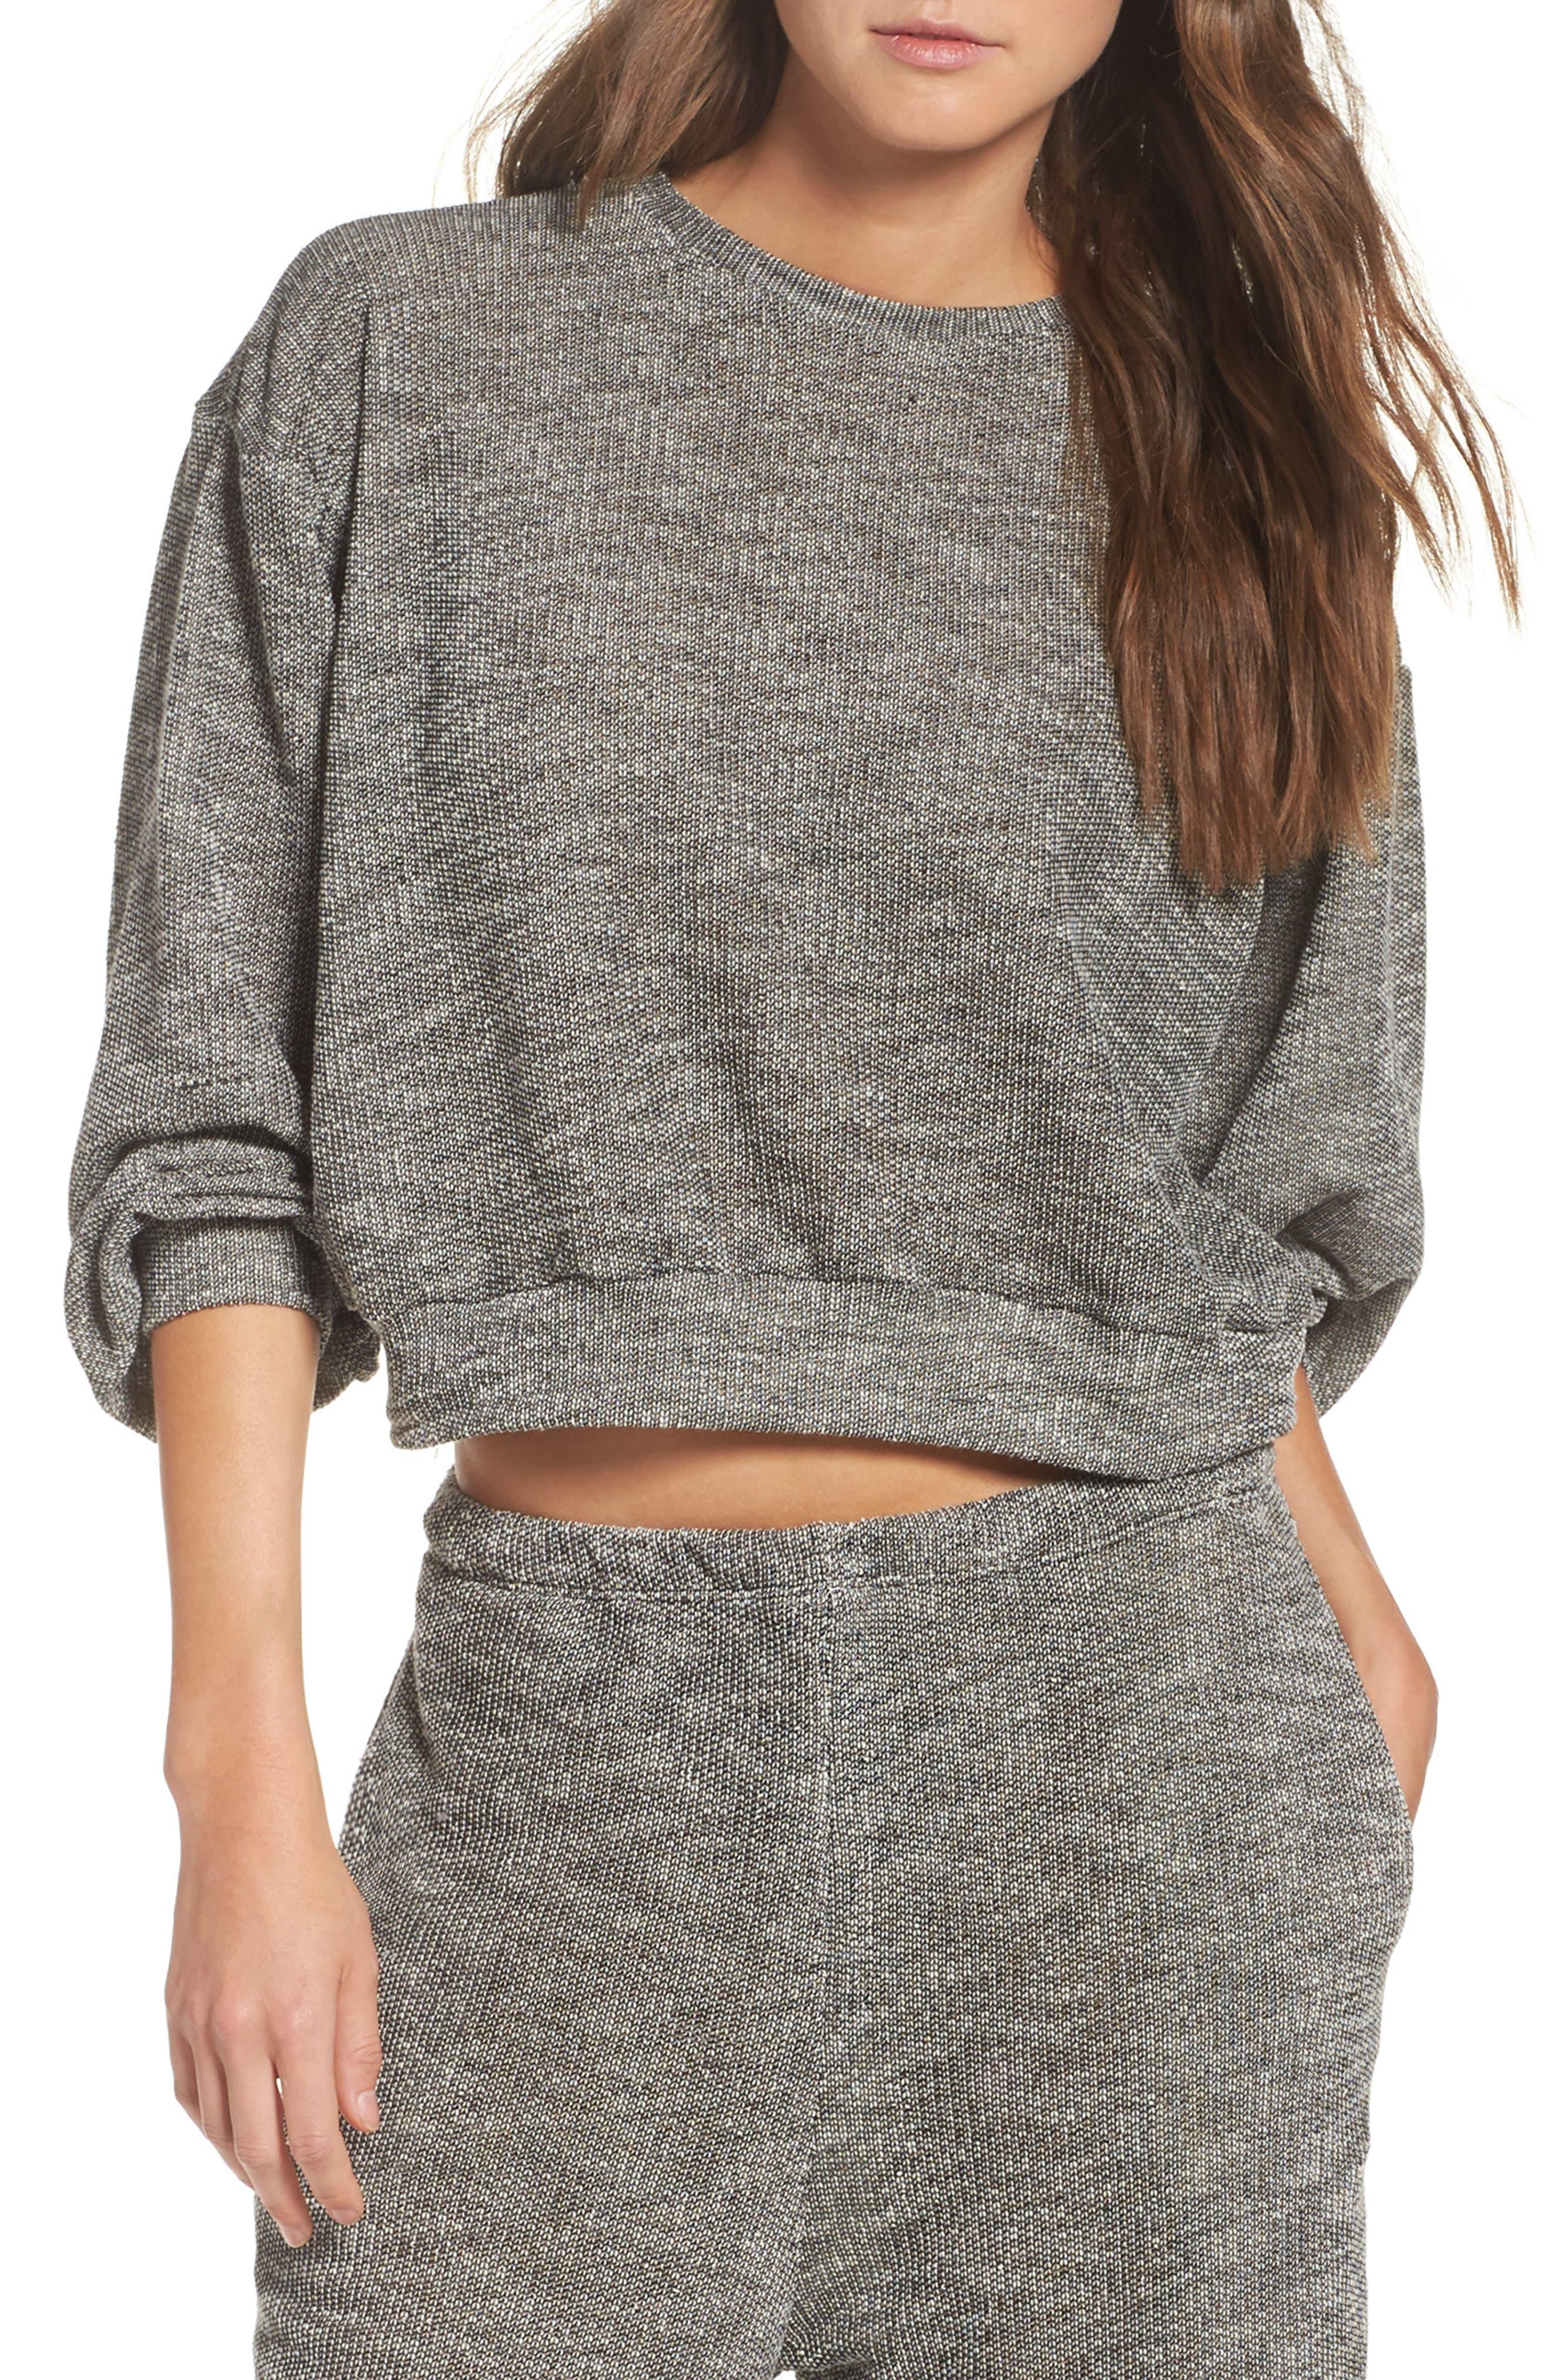 Daydream Nation Crop Lounge Sweater